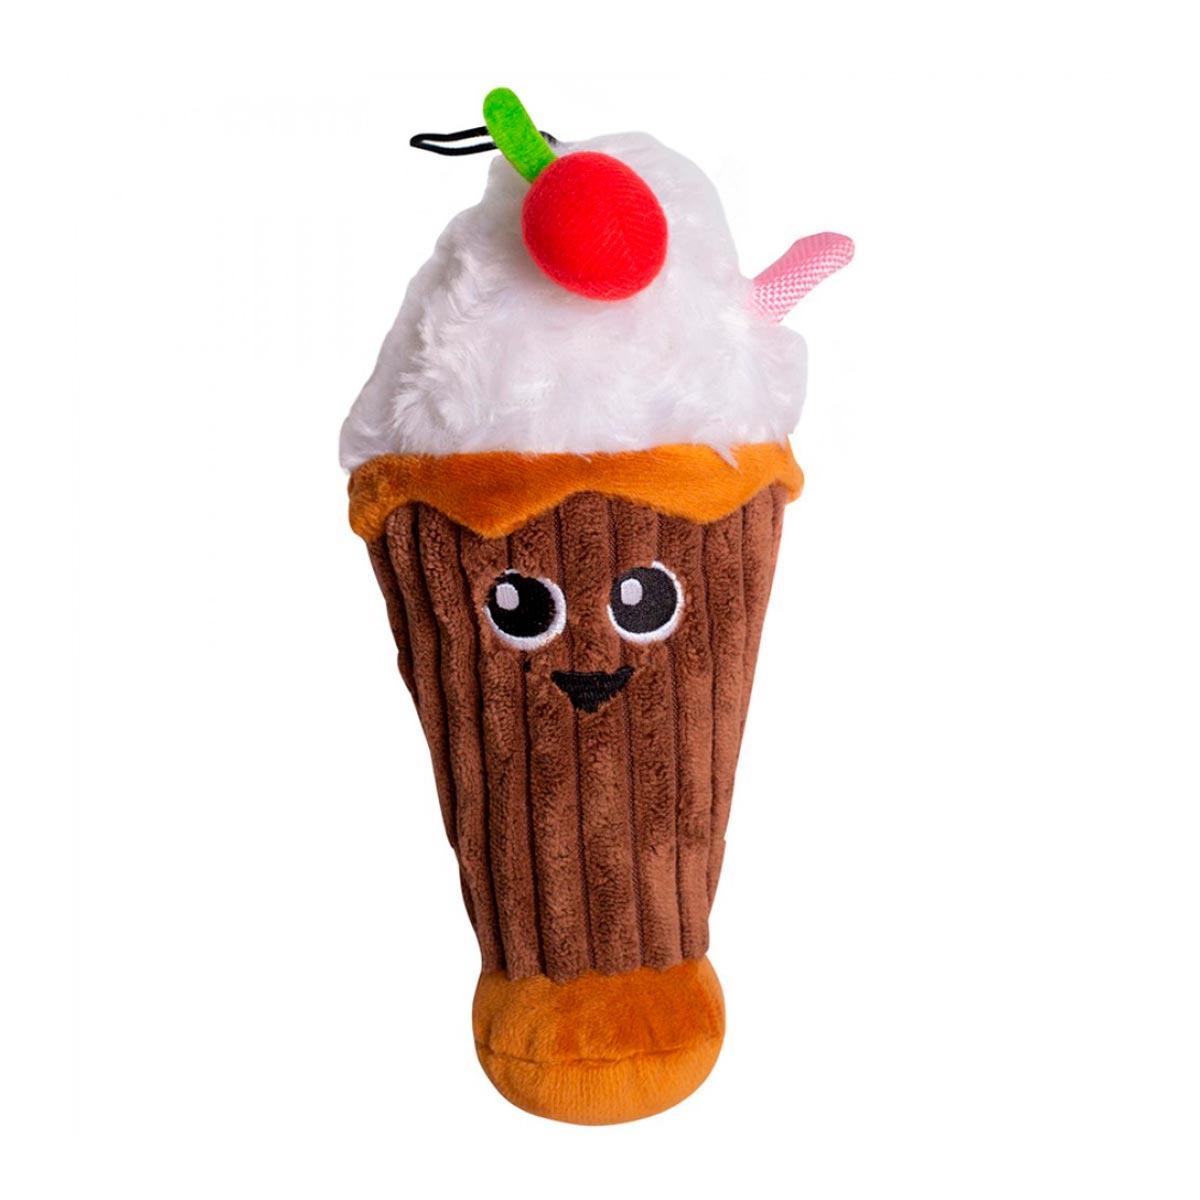 Brinquedo de Pelúcia para Cachorro Sr. Milkshake Adoleta